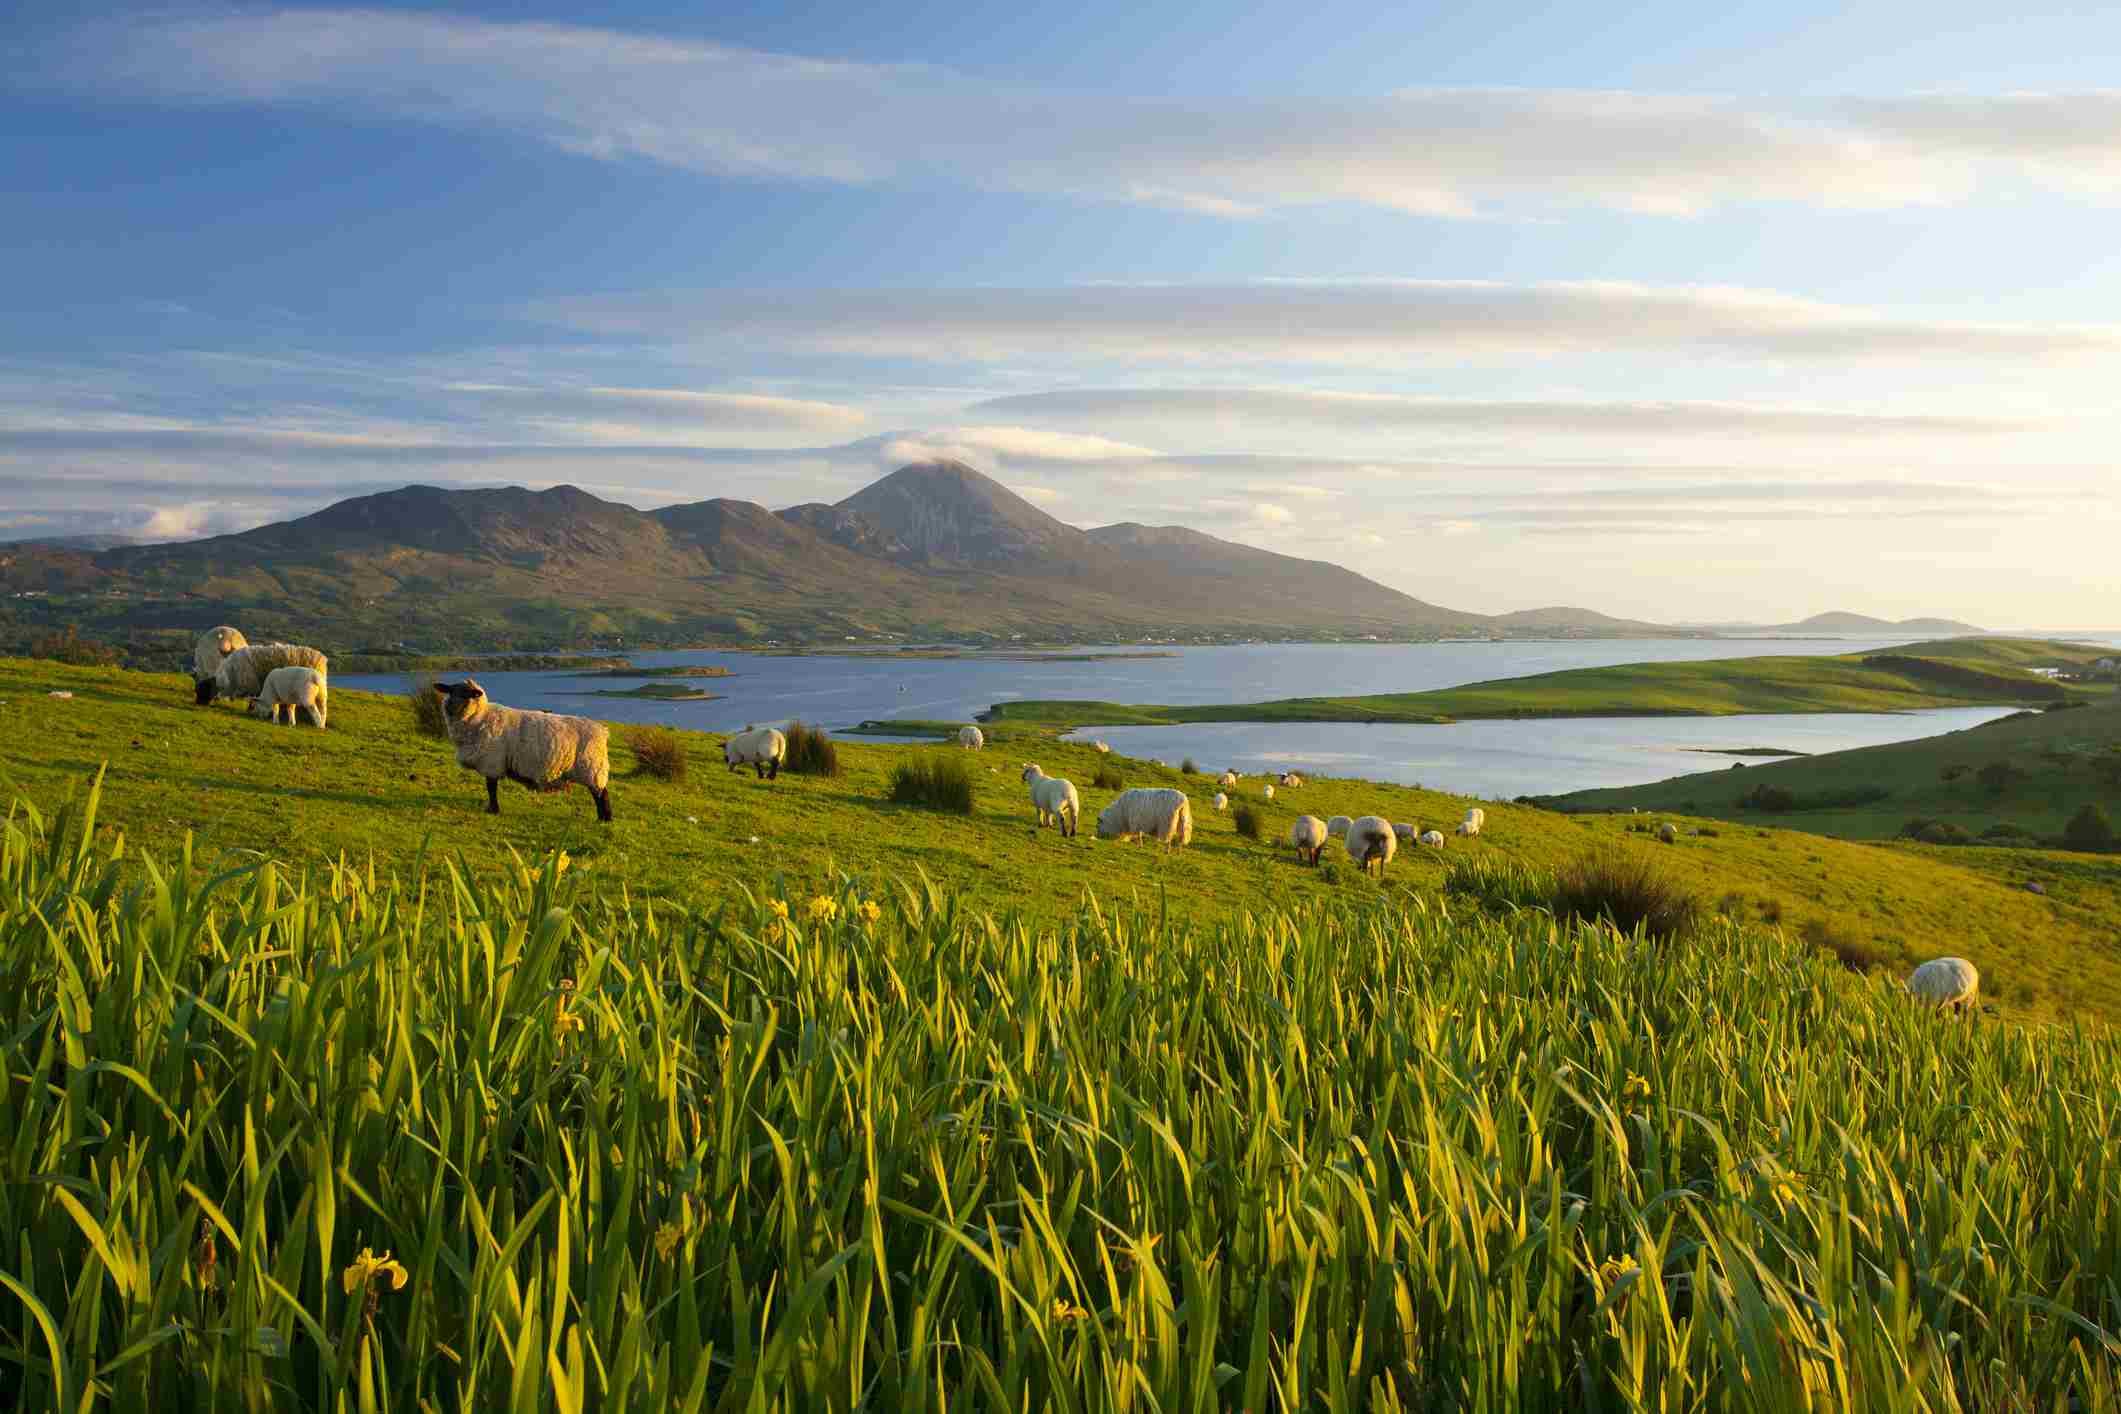 Sheep beneath Croagh Patrick, Mayo, Ireland